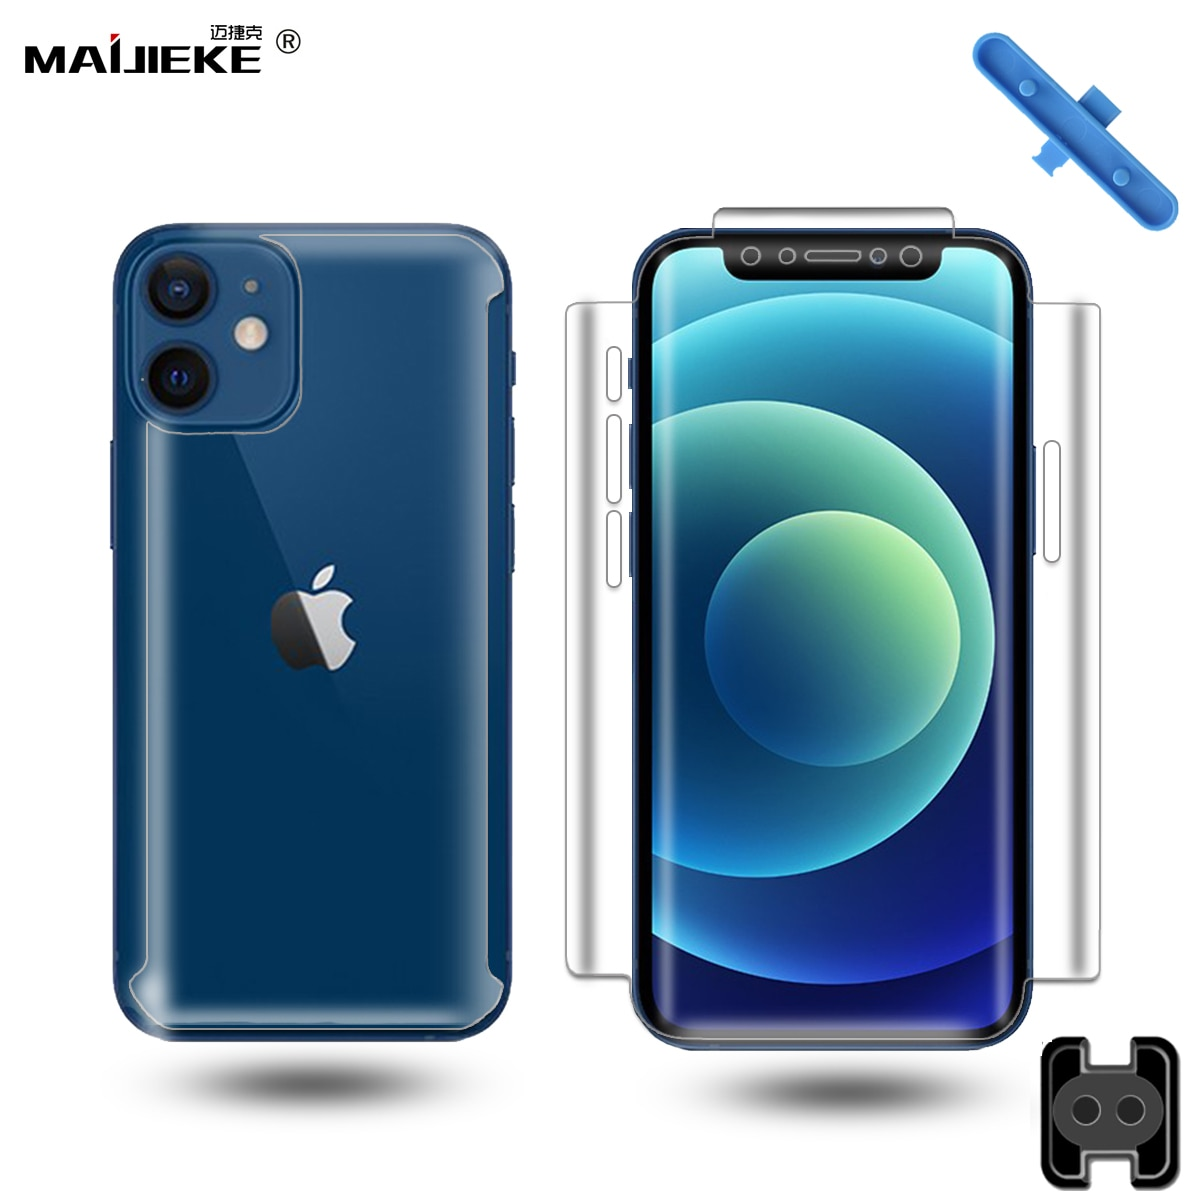 360 Full Body Hydrogel Film Voor Iphone 12 Pro Max Screen Protector Voor Iphone 12 Mini X Xs Max Xr 7 8 Plus Se 2020 Nano Film